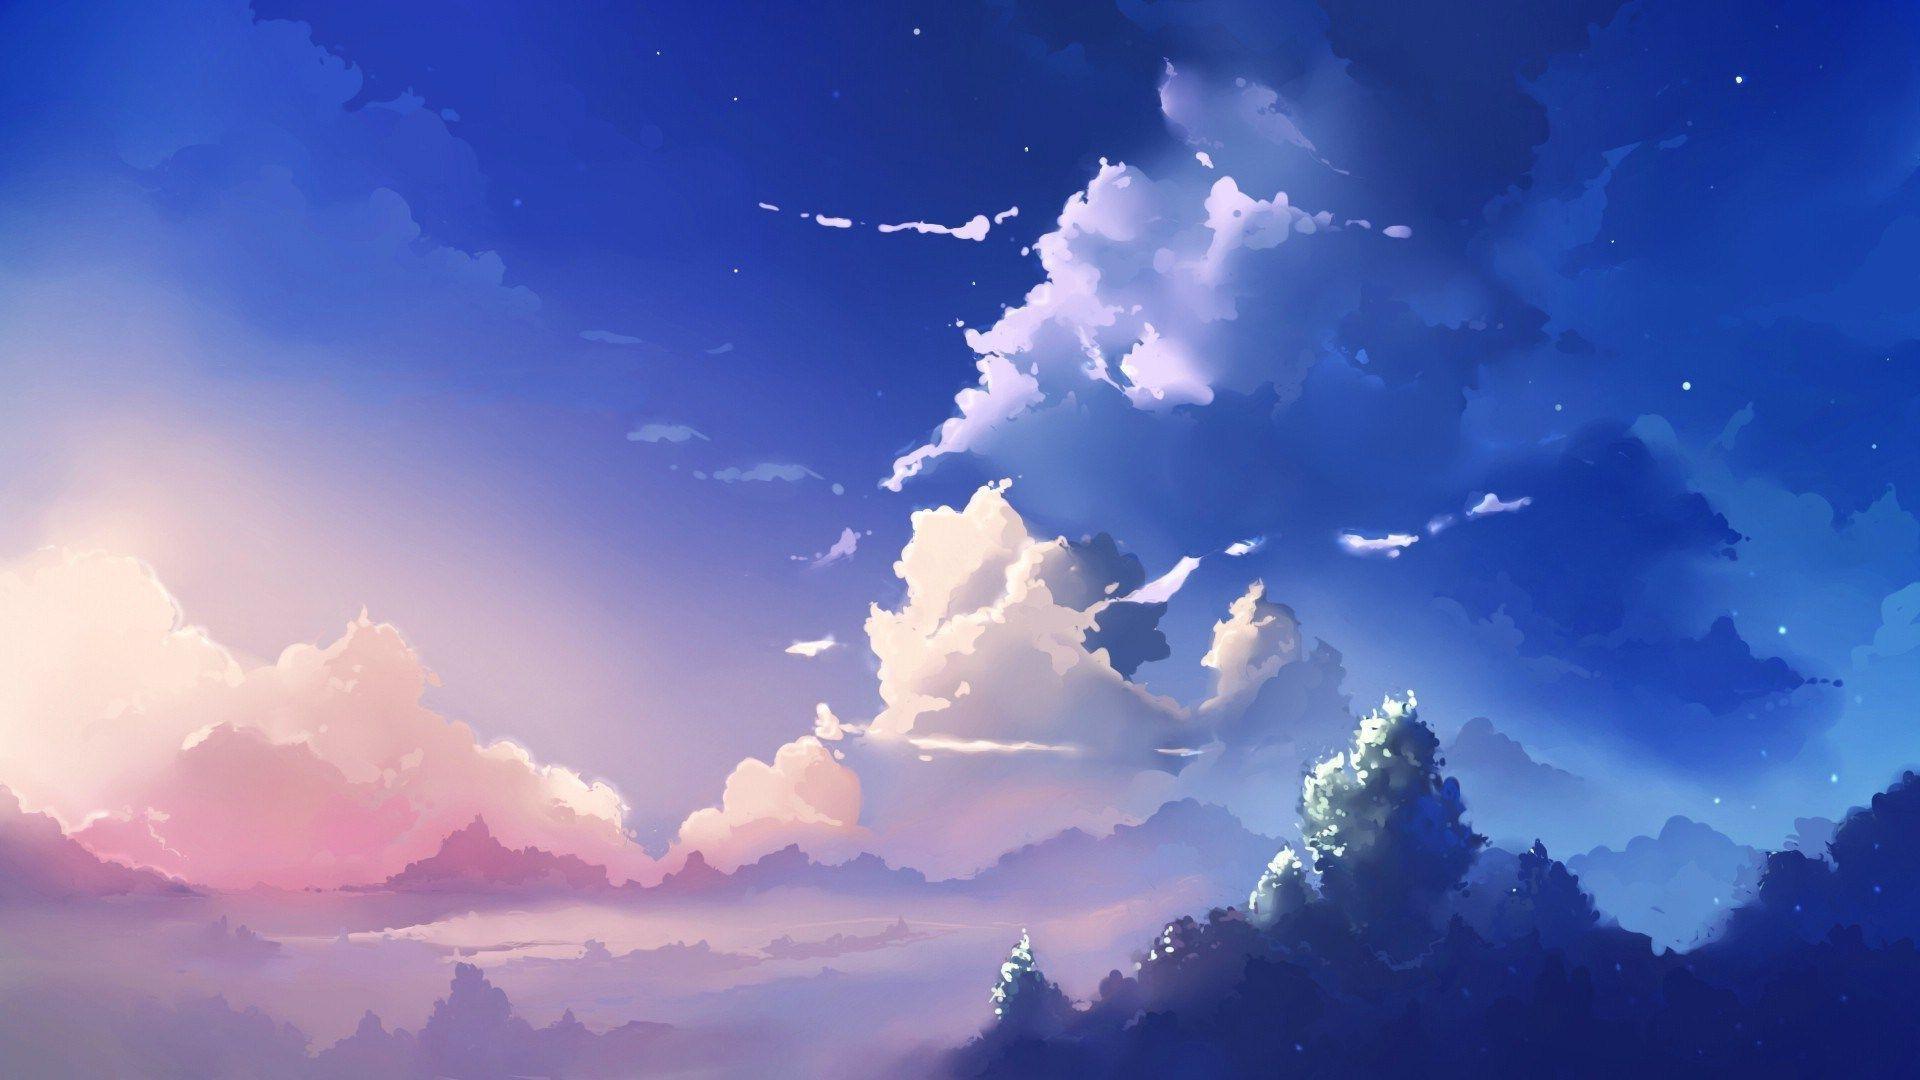 𝐚𝐢𝐫𝐝𝐫𝐨𝐩 𝐜𝐡𝐨𝐢 𝐬𝐚𝐧 F I V E Anime Scenery Wallpaper Anime Scenery Anime Background